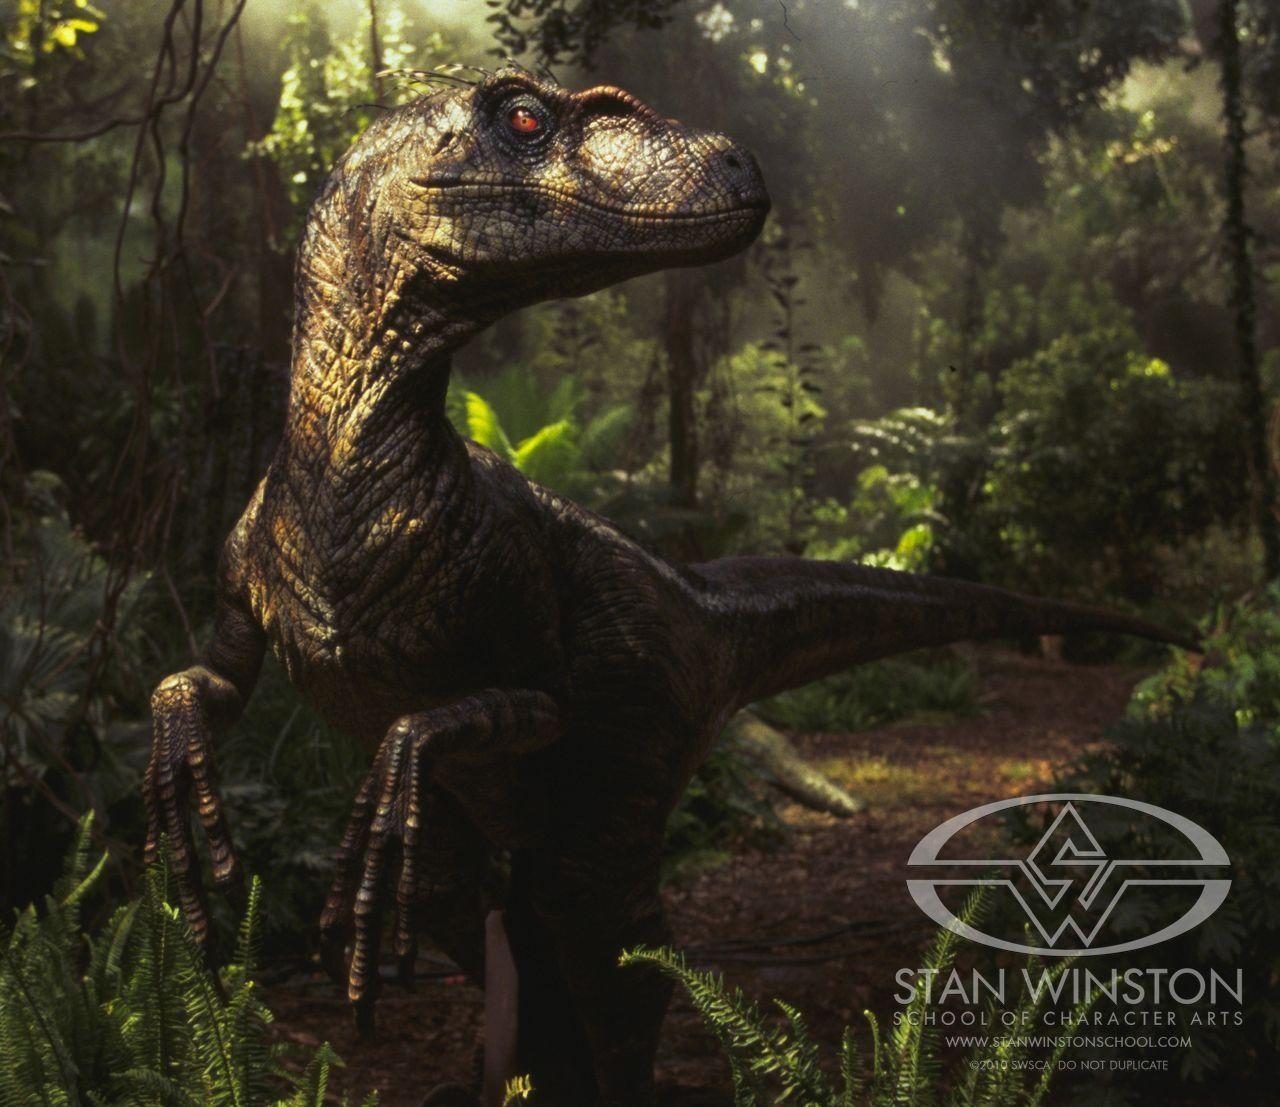 Jurassic Park Scenes Footage Of Puppeteer